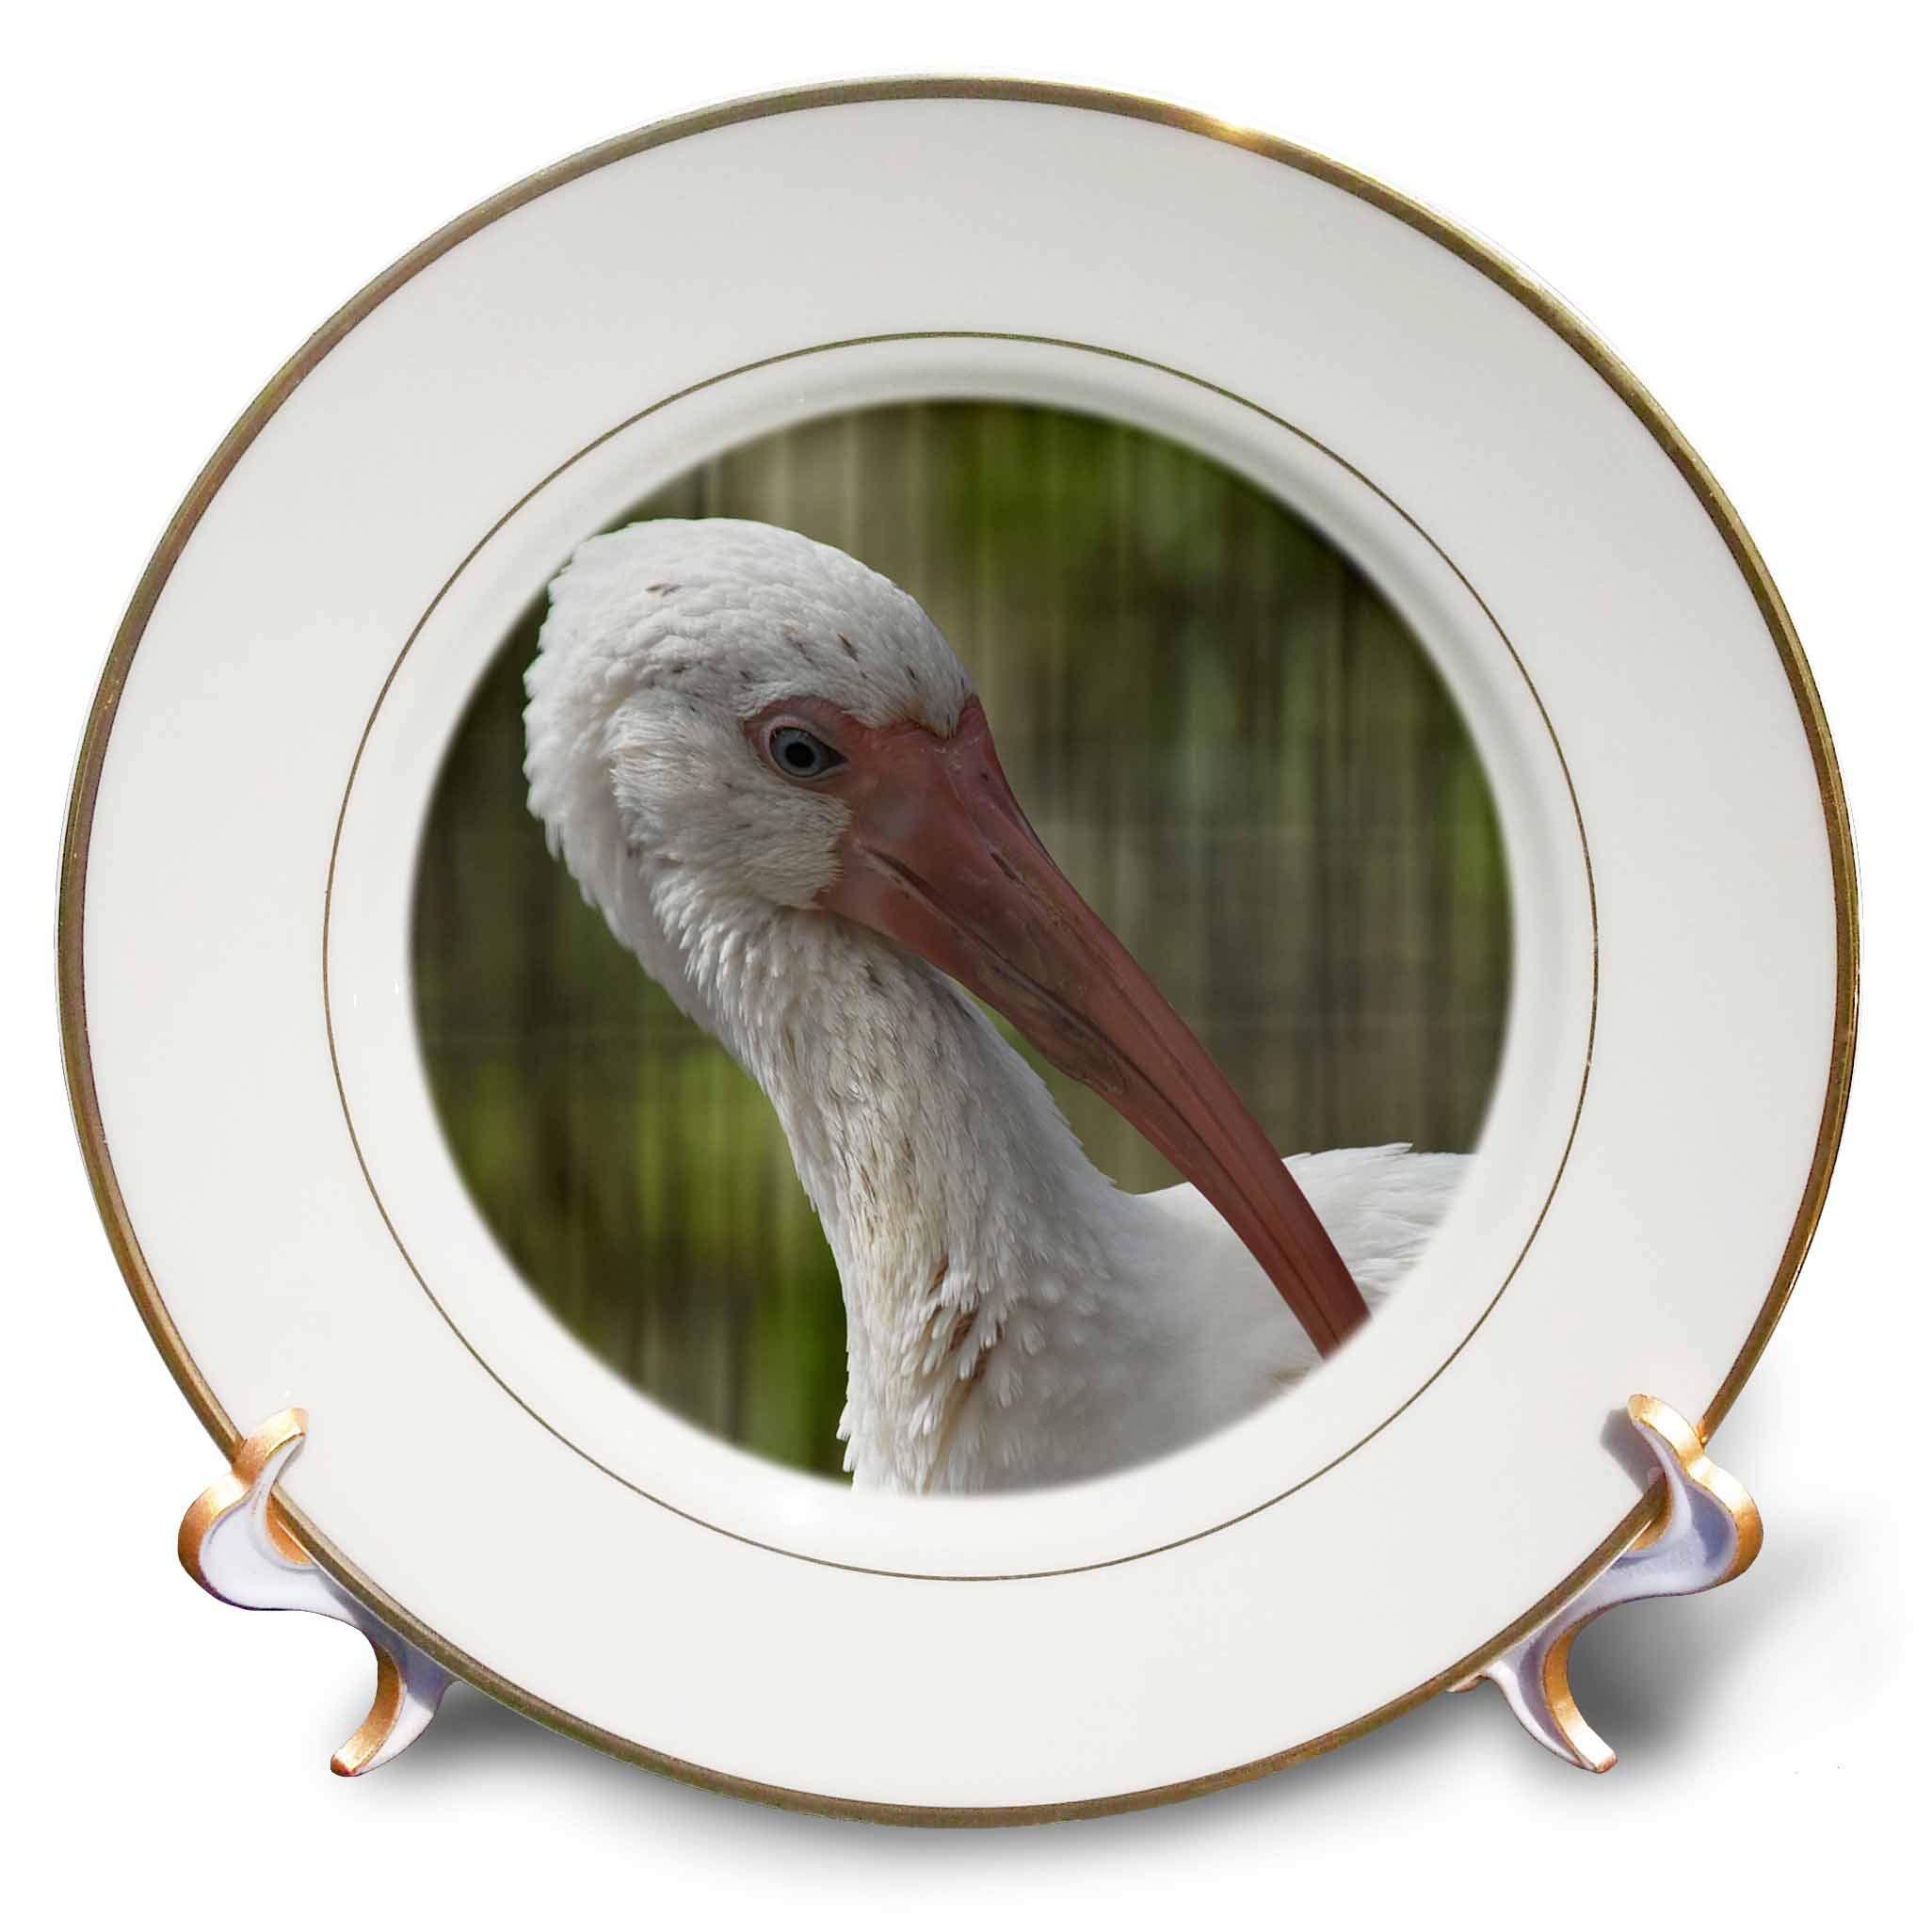 3dRose Susans Zoo Crew Animal - Ibis Bird Head up Close - 8 inch Porcelain Plate (cp_294897_1)